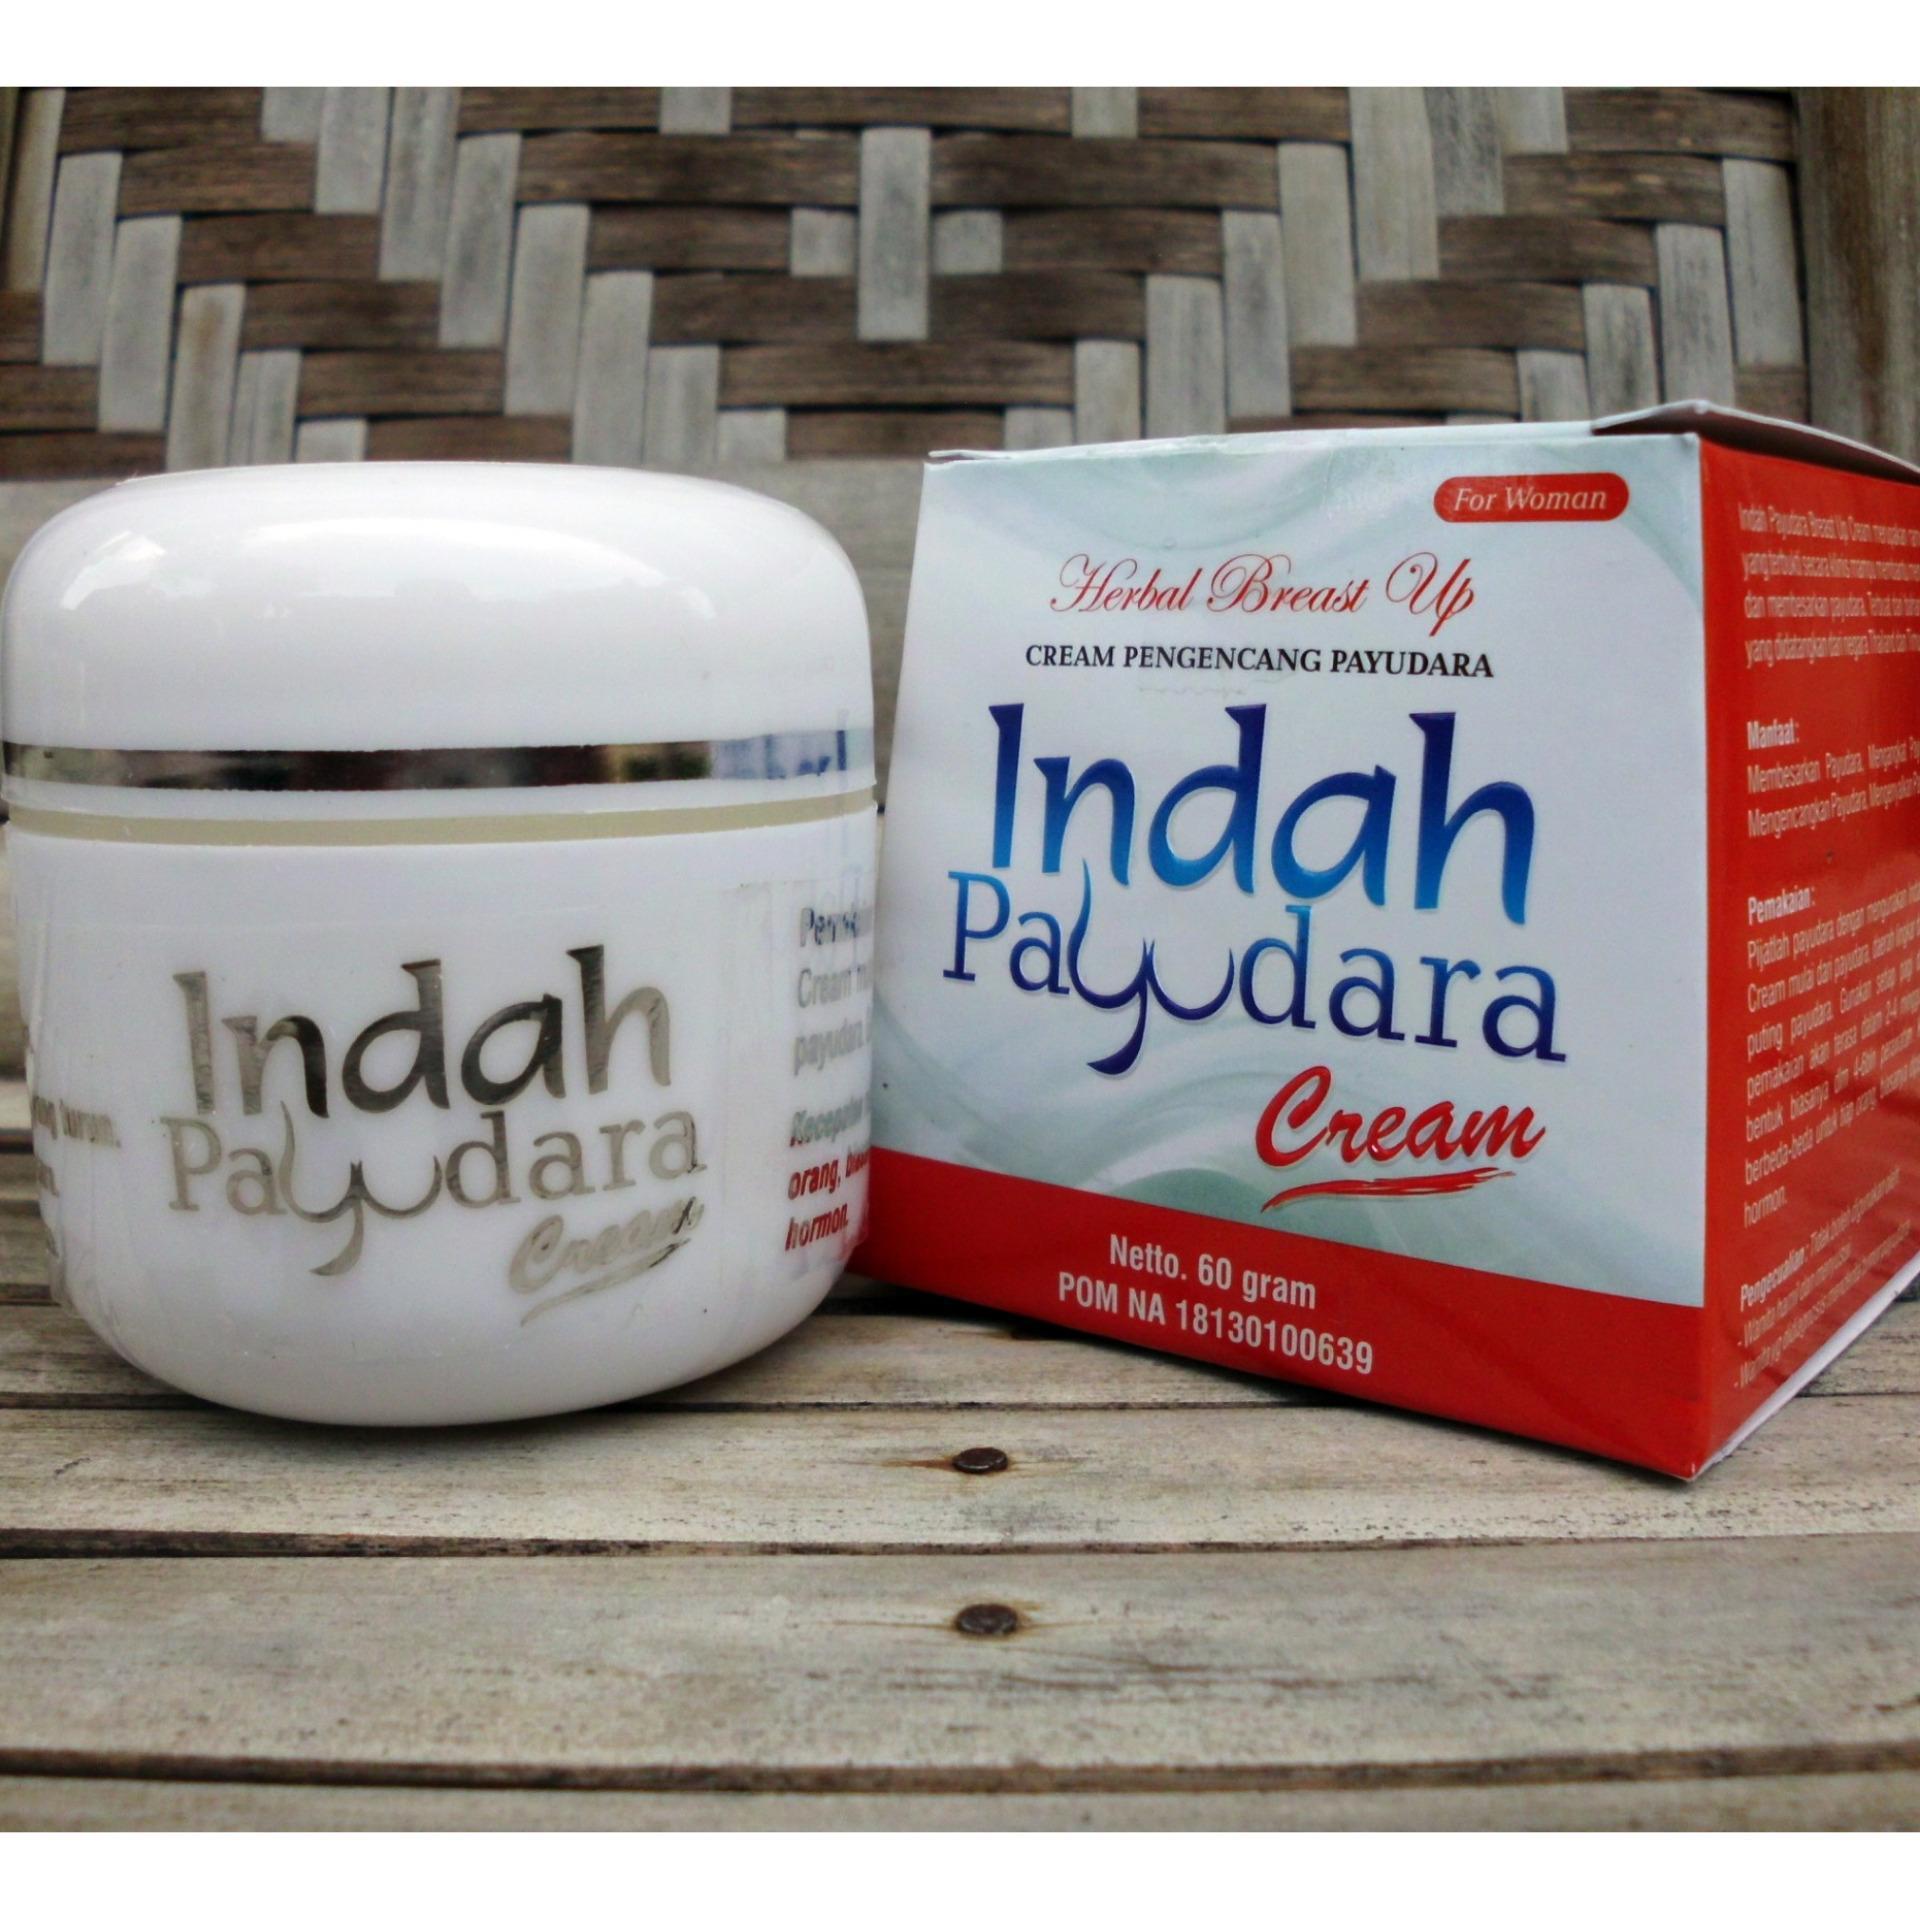 Addawa Indah Payudara Cream - 60g